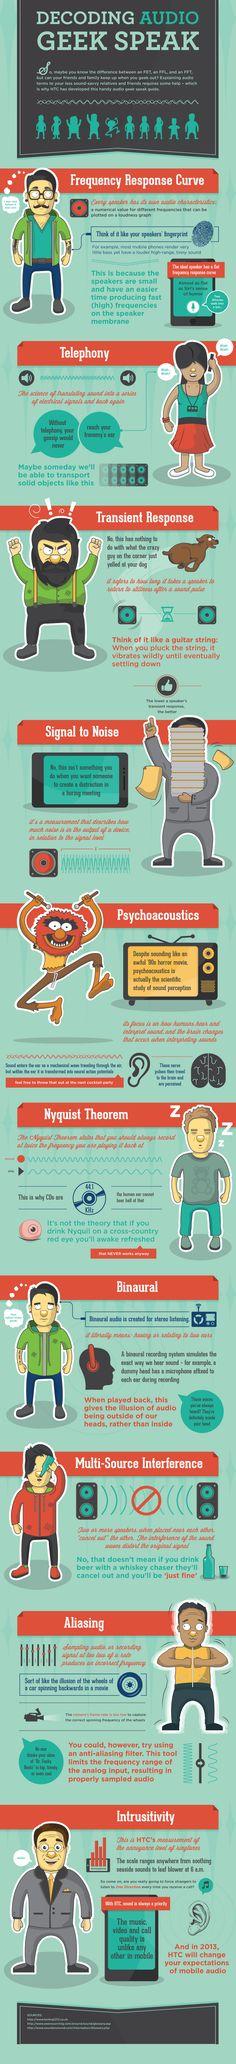 Decoding #Audio #Geek Speak  HTC Infographic